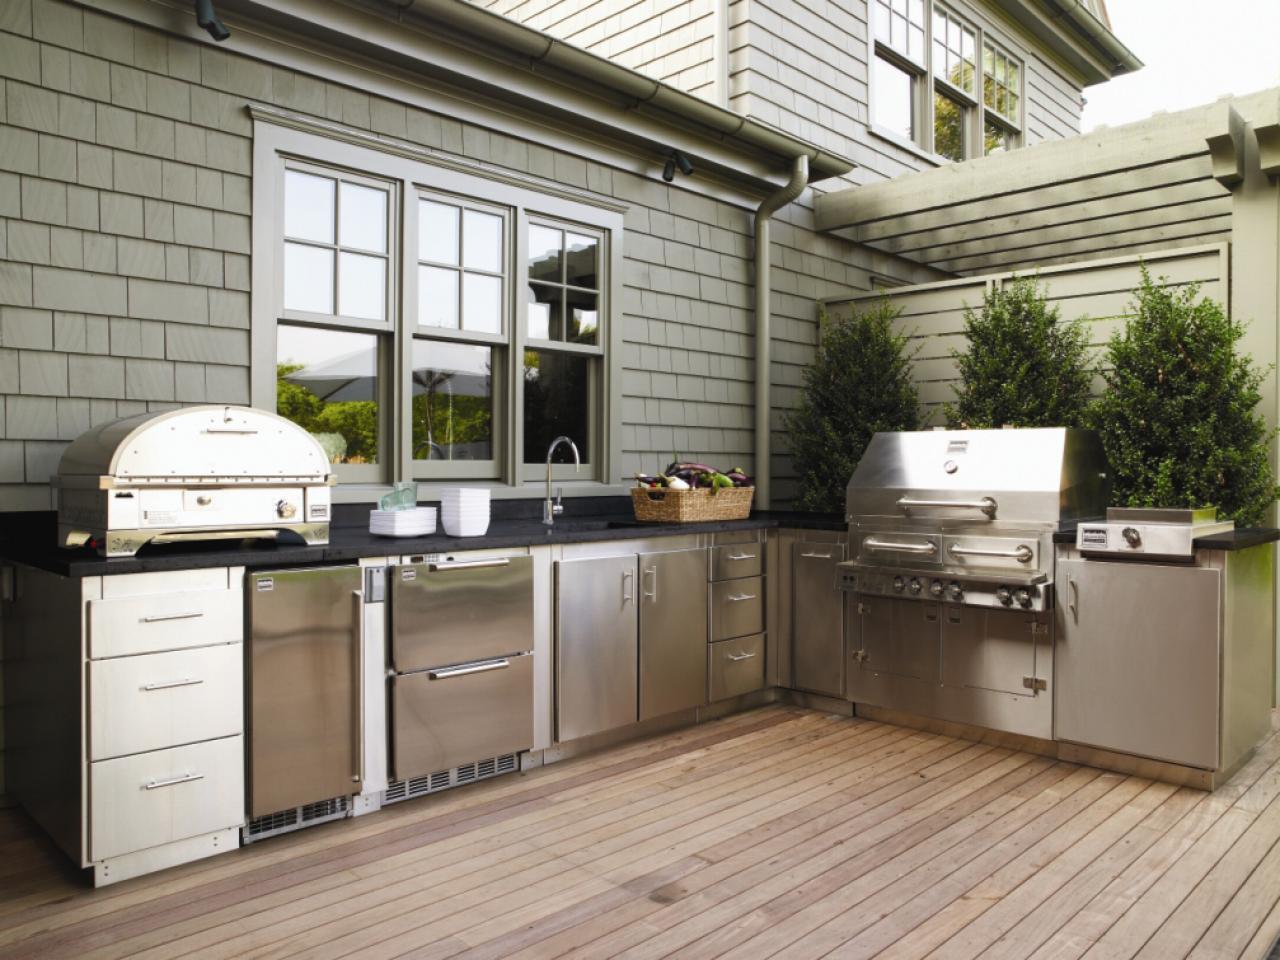 For Outdoor Kitchens Outdoor Kitchen Trends Diy